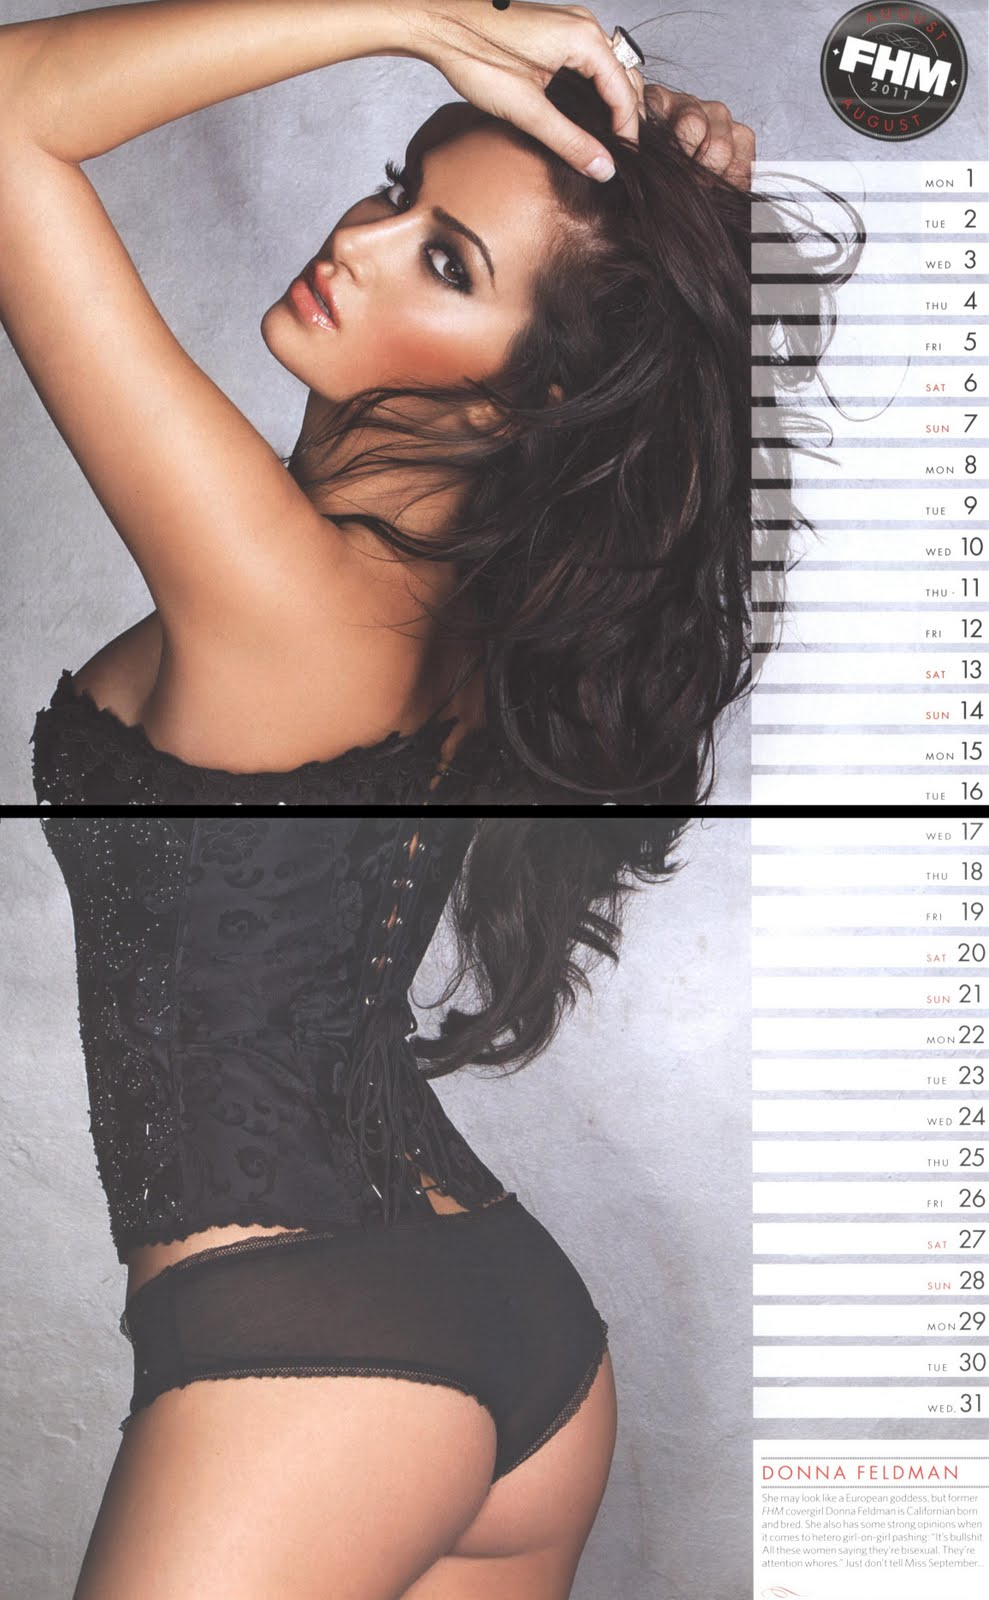 Donna feldman hot in fashion house 34